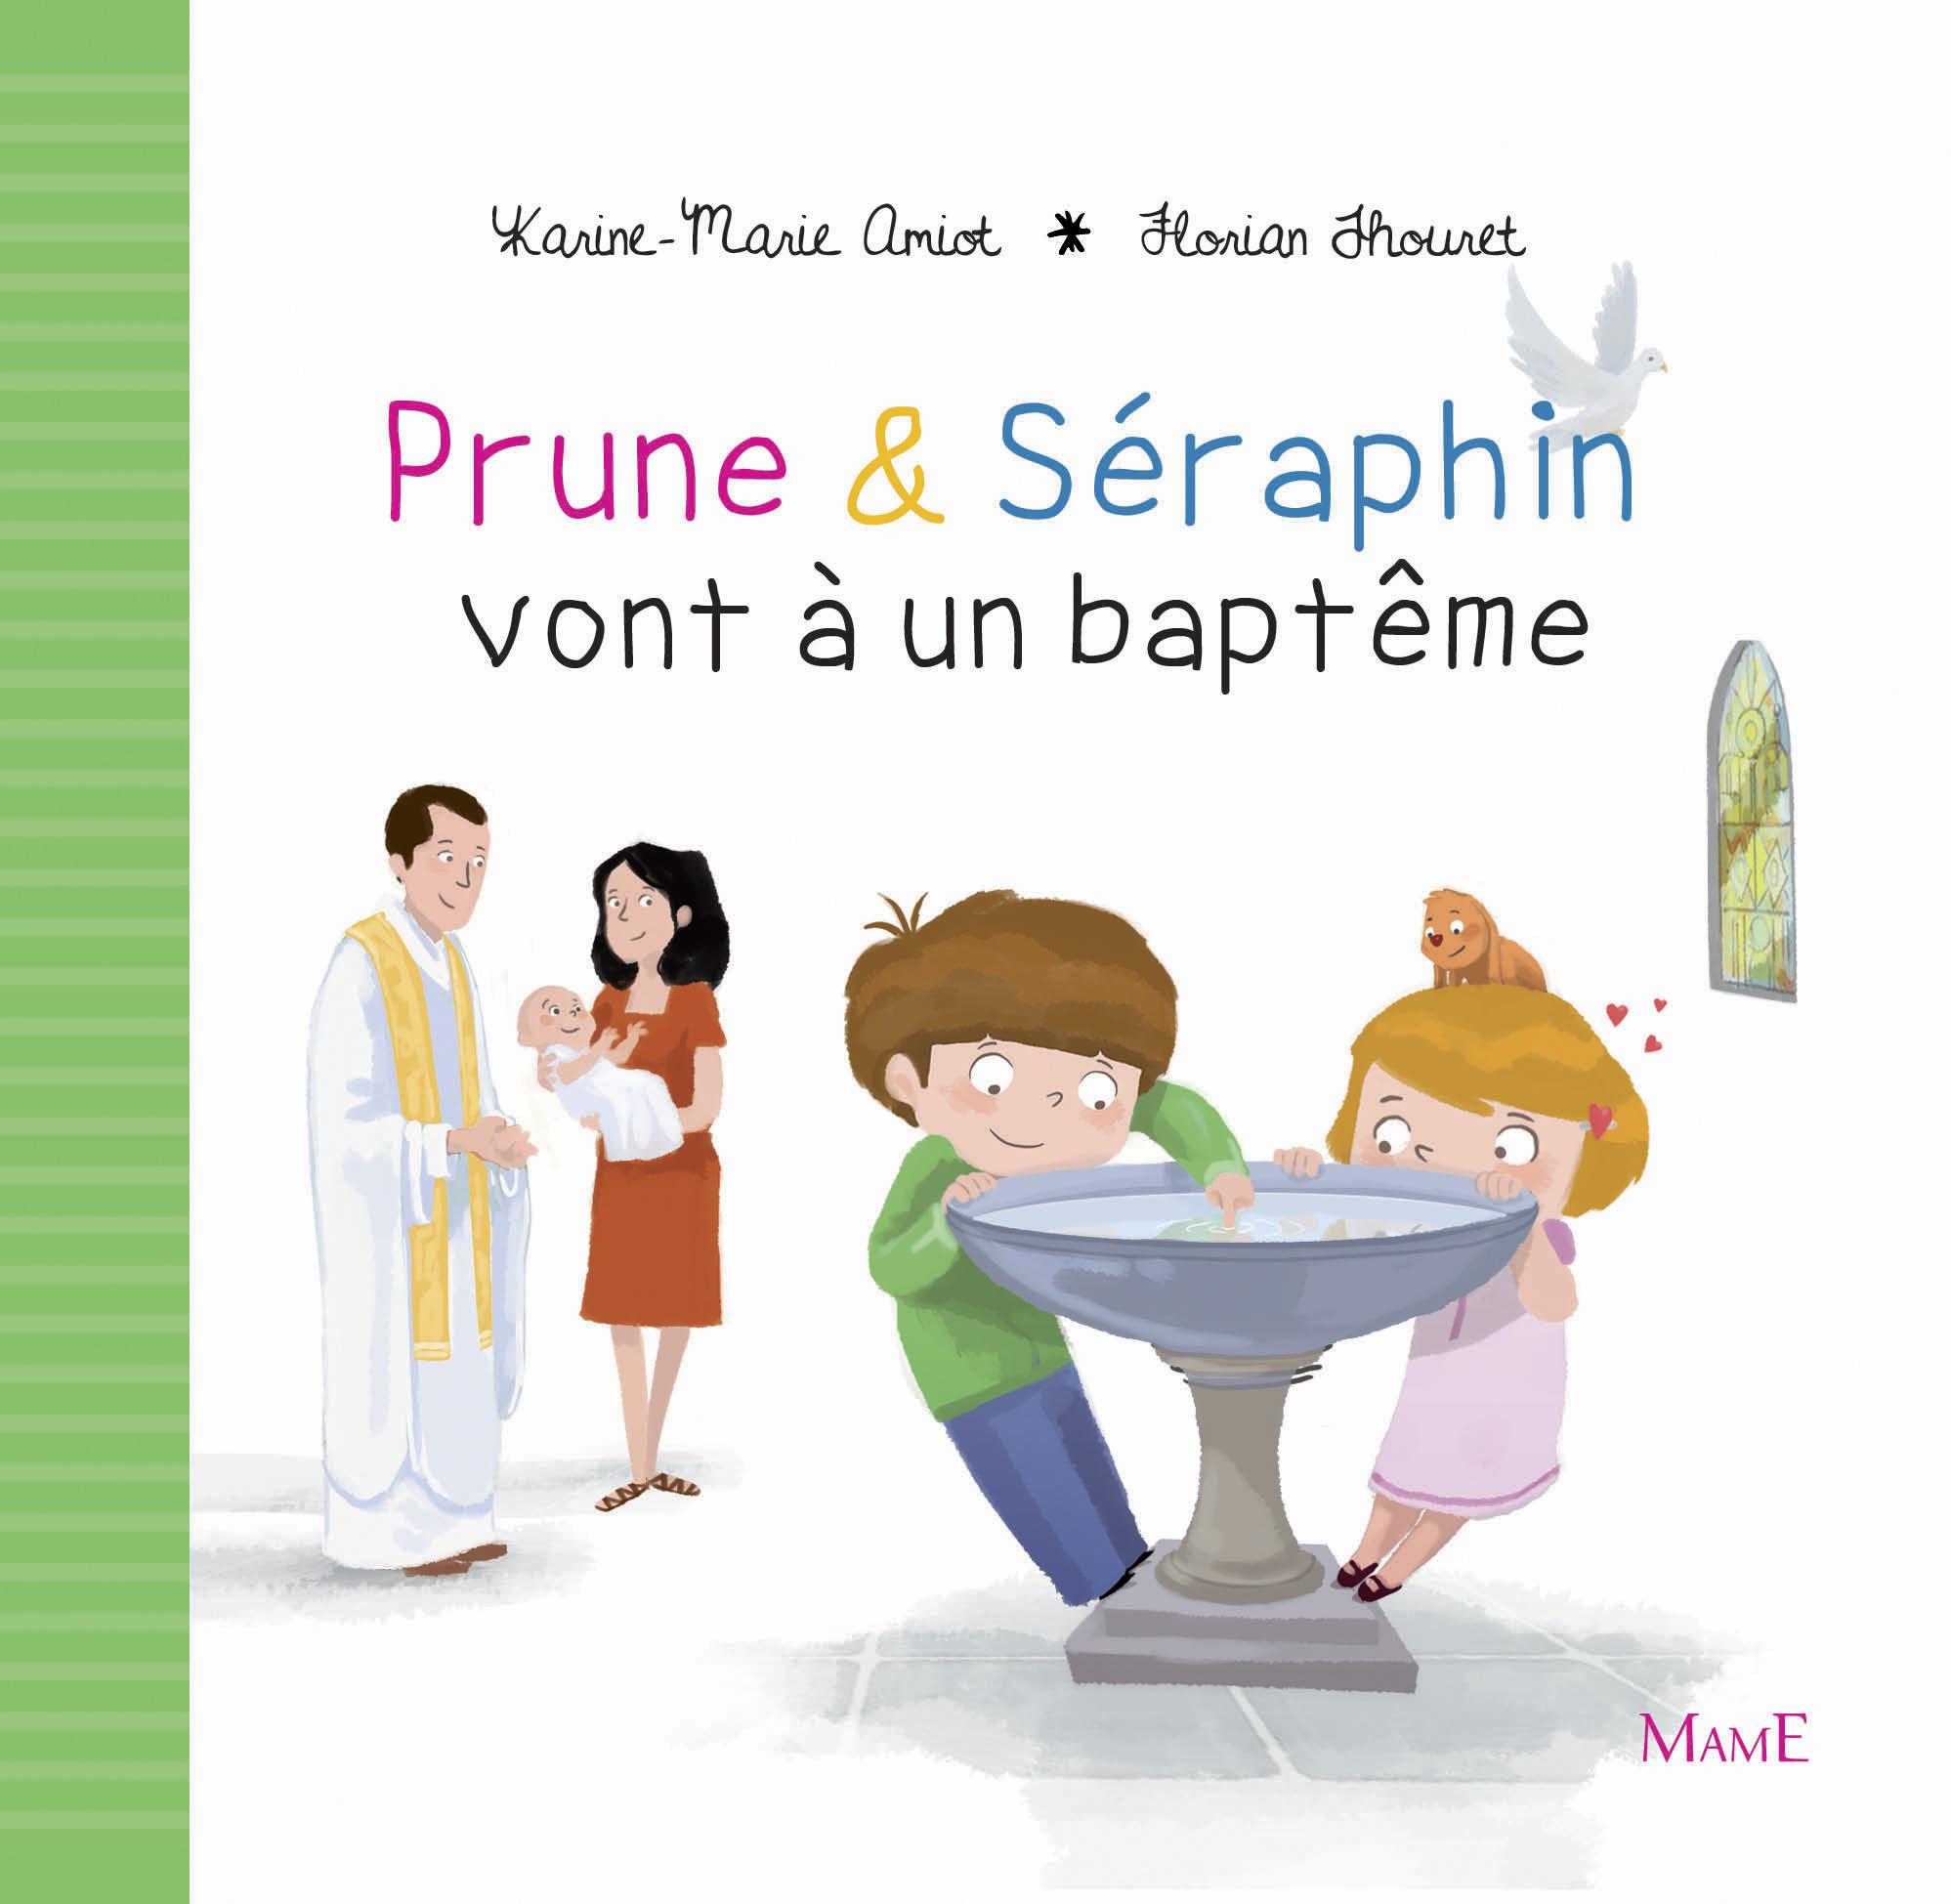 PRUNE ET SERAPHIN VONT A UN BAPTEME